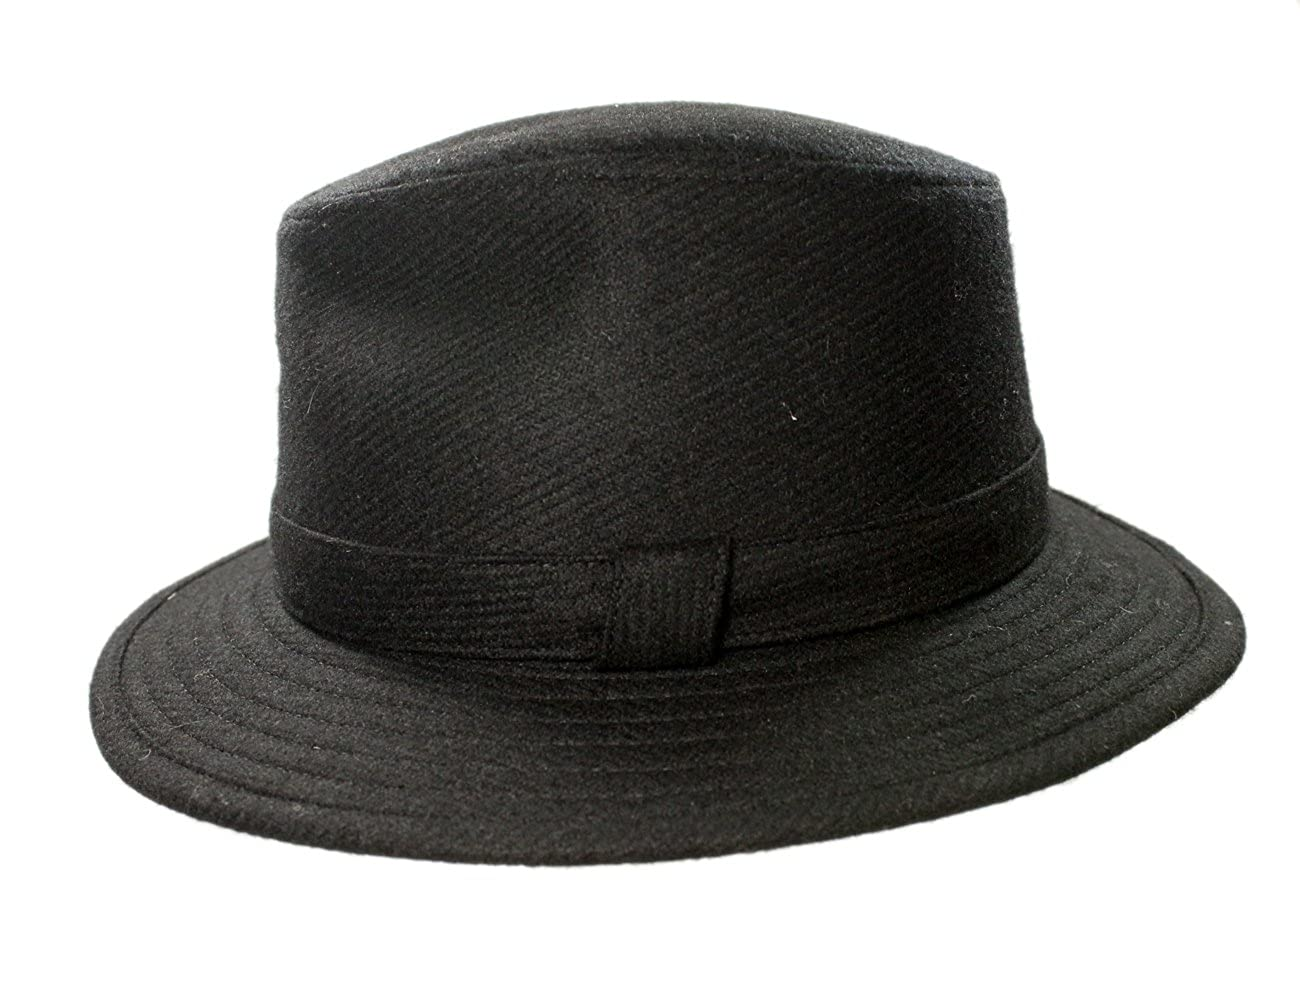 e00bdefeb17 Biddy Murphy Men s Irish Fedora 100% Wool Tweed Made in Ireland at ...